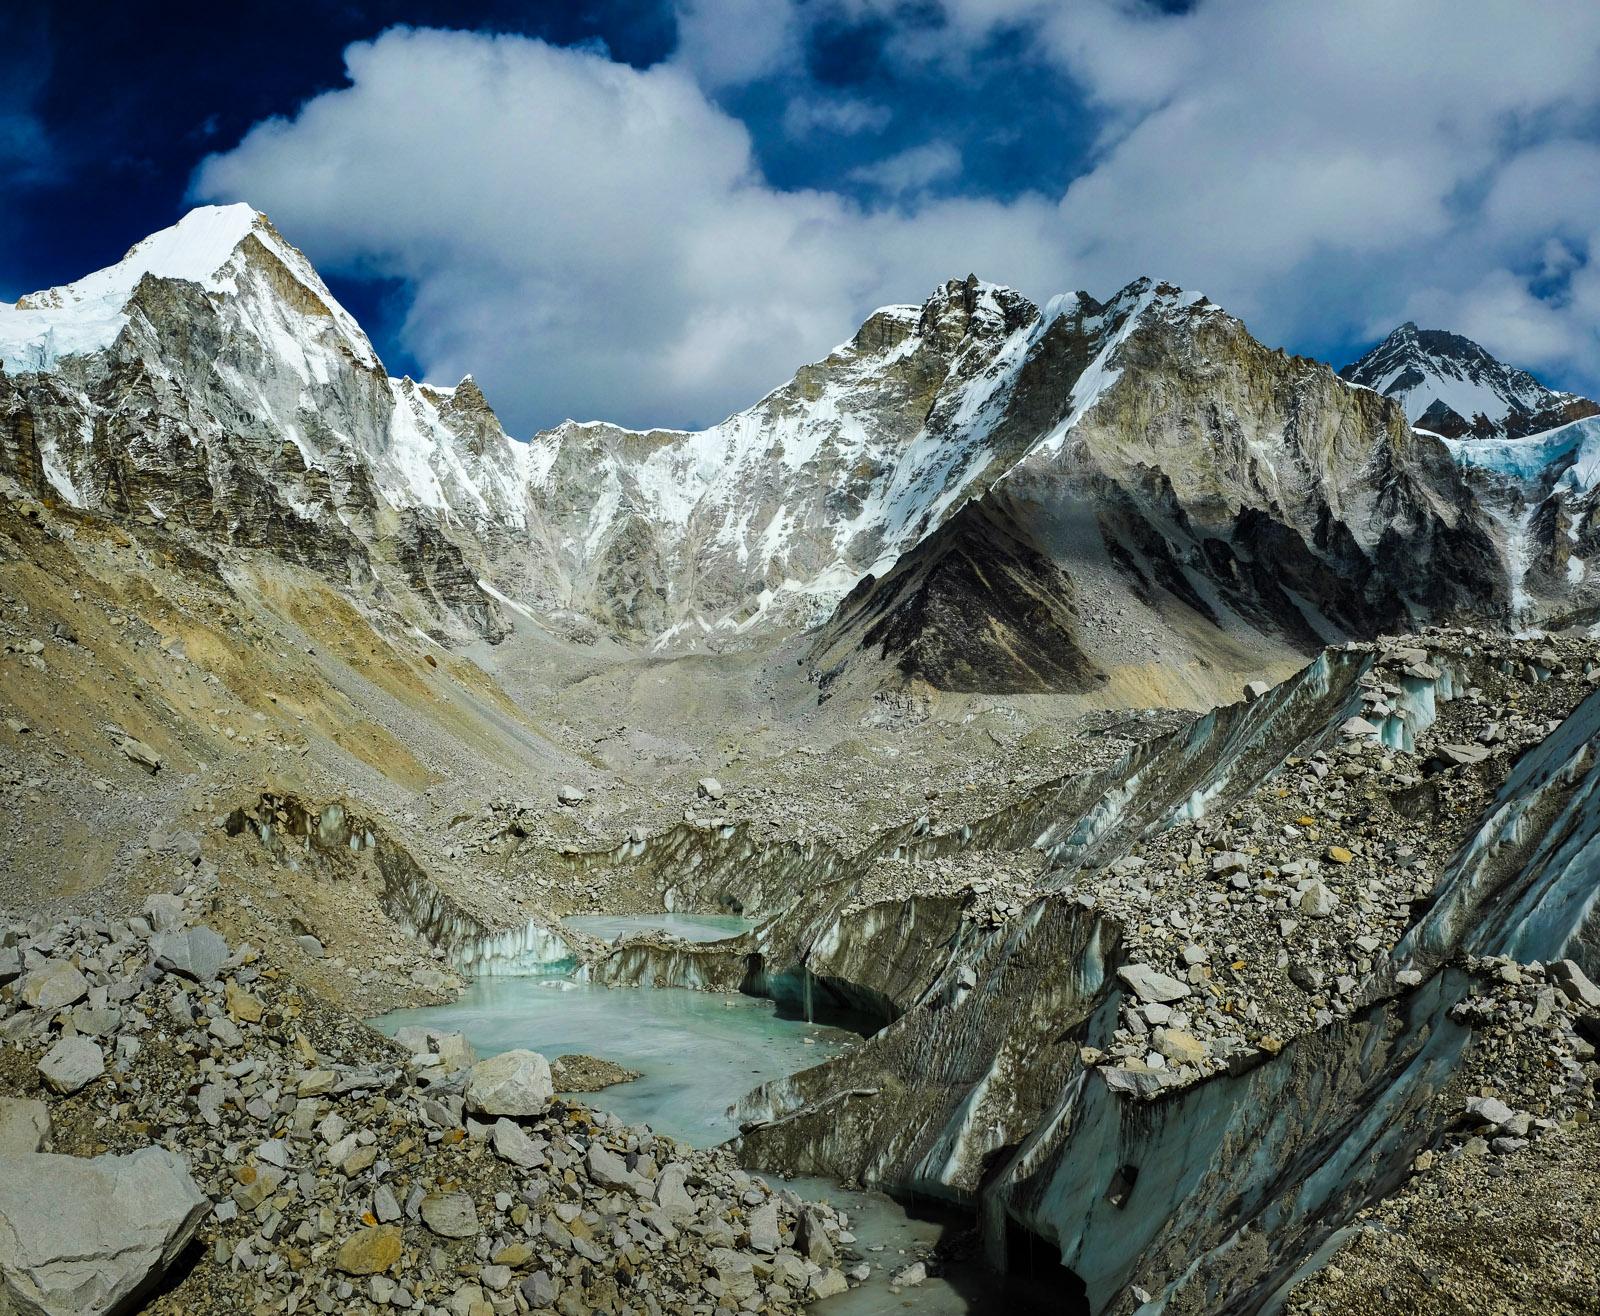 базовий табір Евересту (Everest Base Camp, EBC)